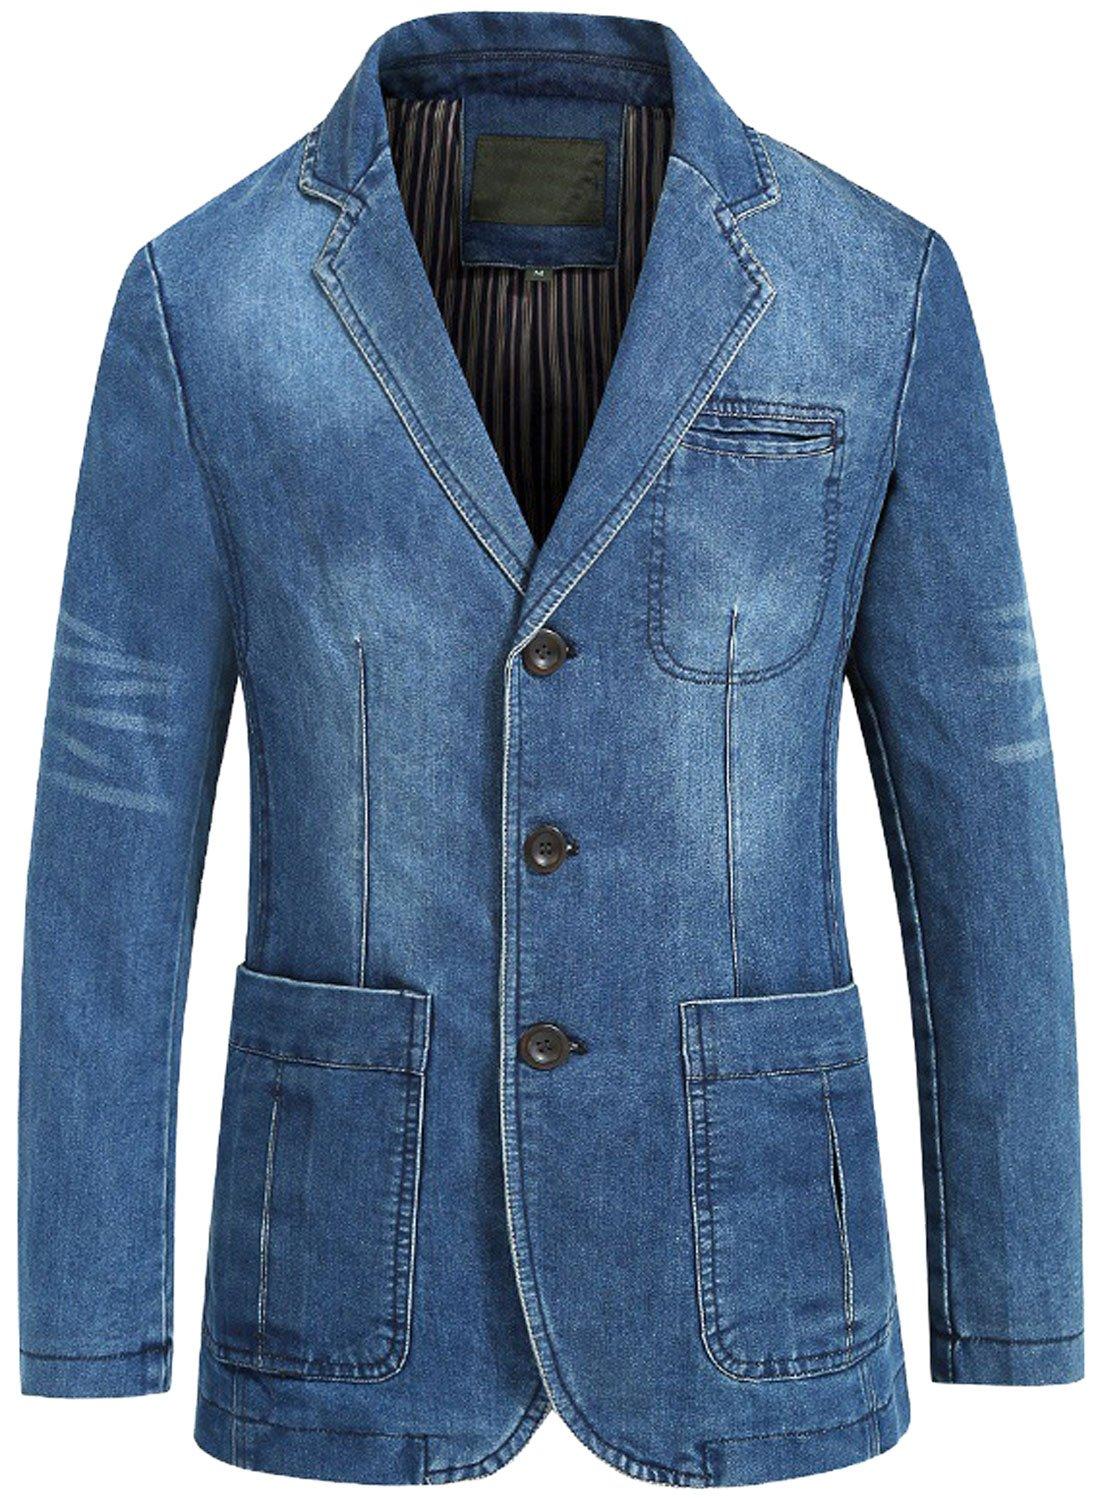 chouyatou Men's Classic Notched Collar 3 Button Tailoring Distressed Denim Blazer Jacket (X-Large, Blue) by chouyatou